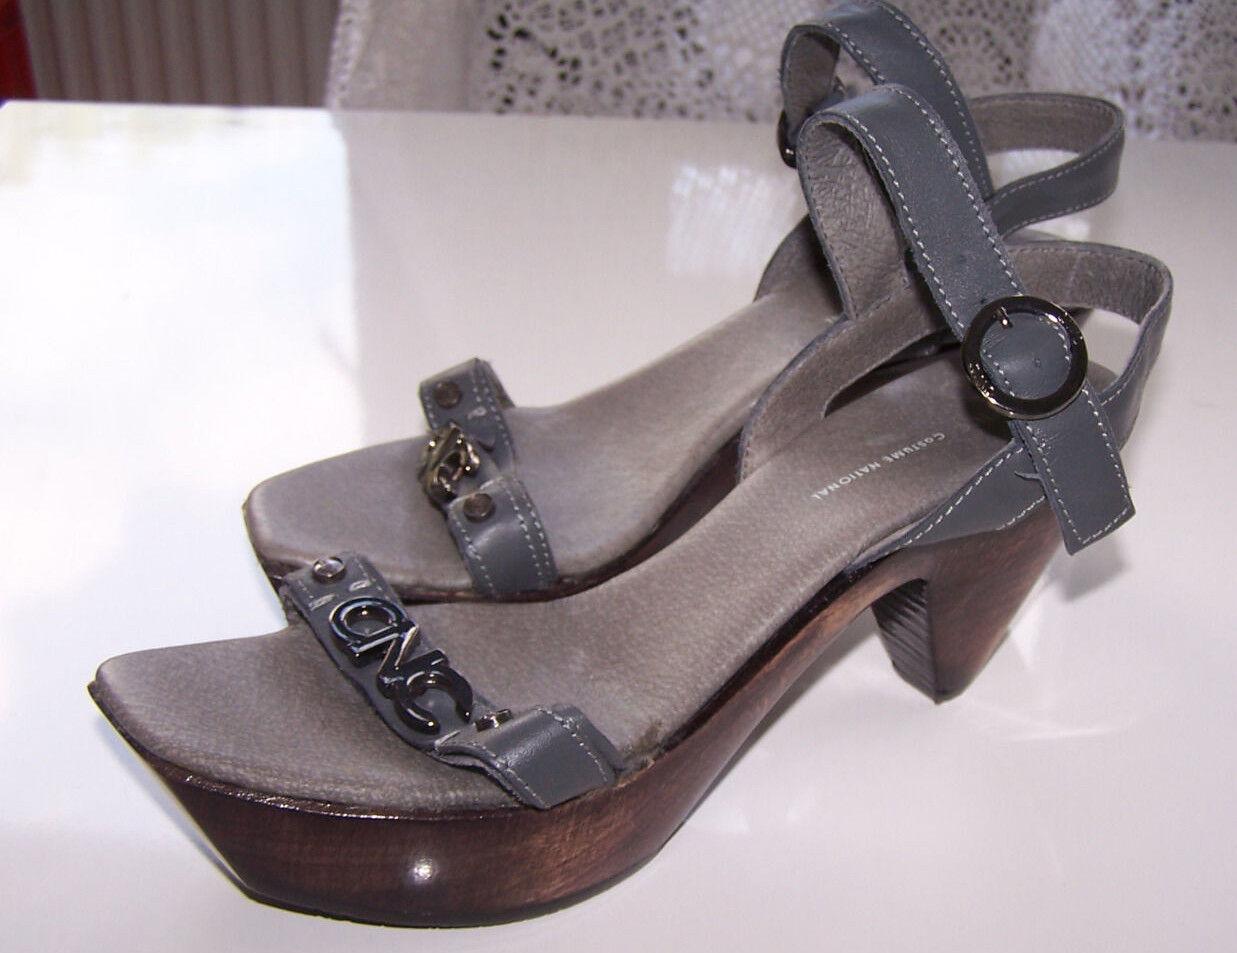 CNC Costume National Sandale Super schicker Damen Schuhe Sandale National Neu ungetragen 460d8e